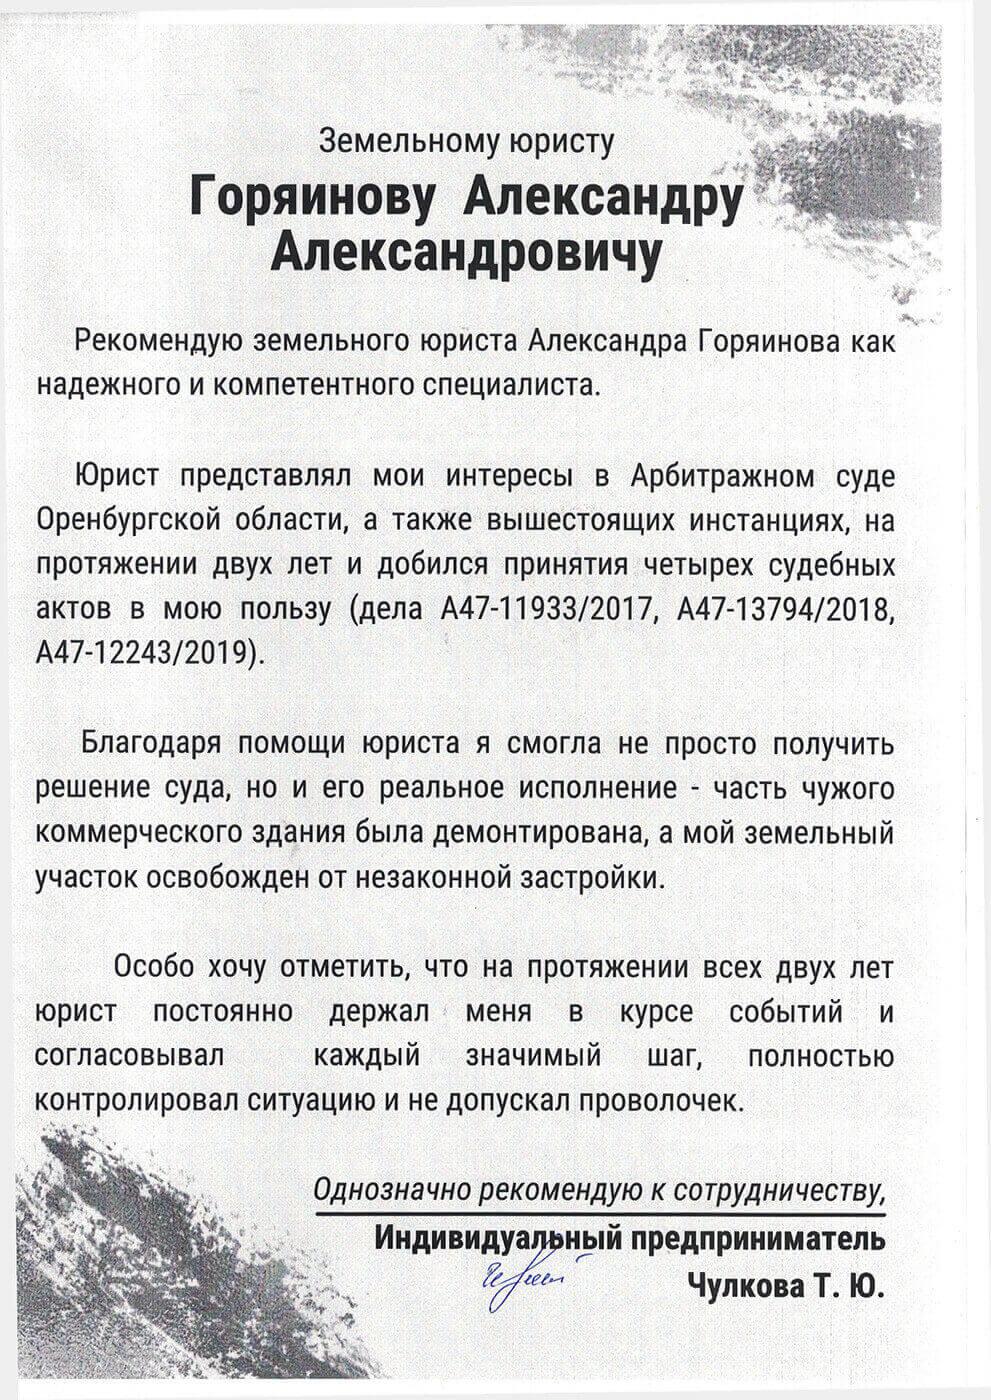 Рекомендация от ИП Чулковой Т. Ю.